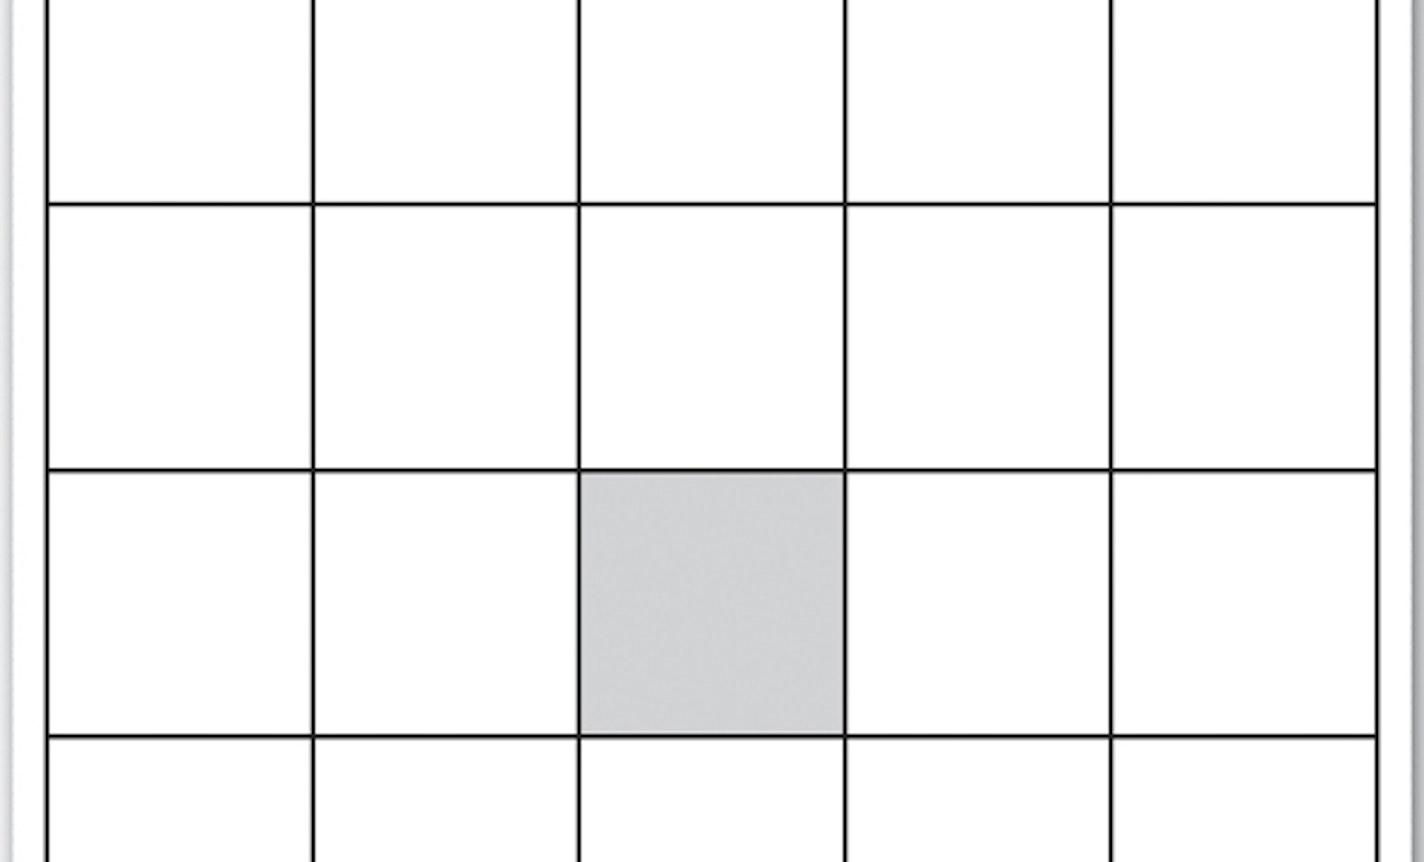 Virtual Bingo with COPE